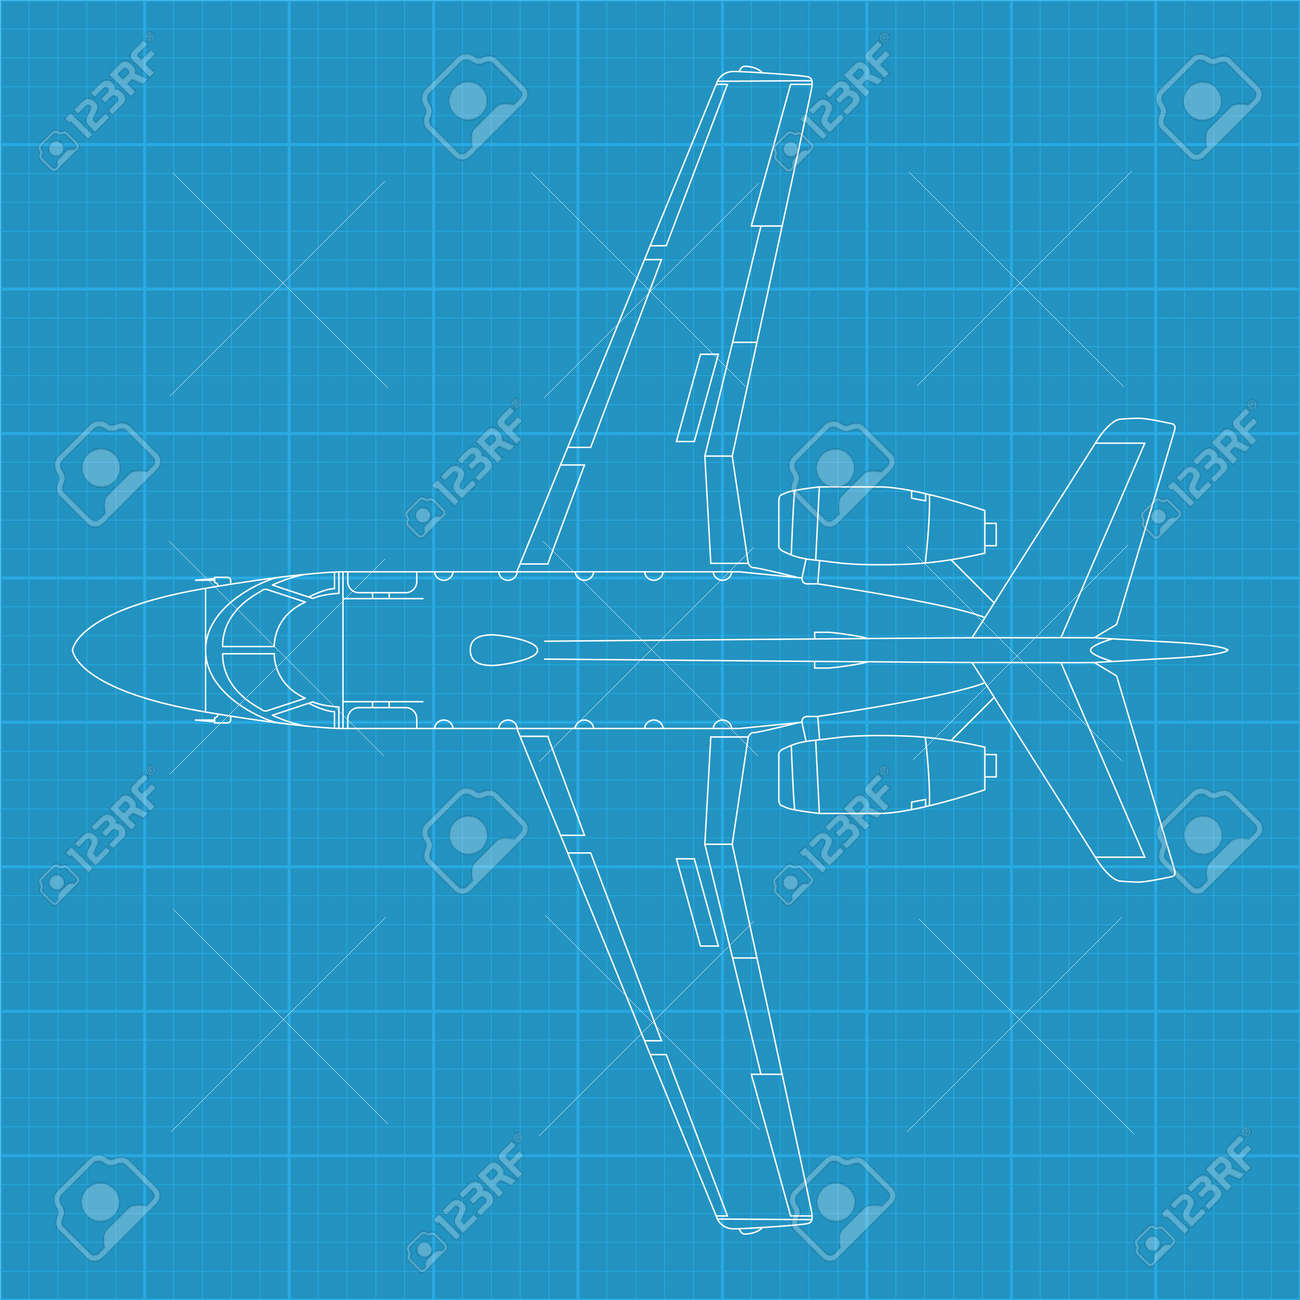 high detailed vector illustration of modern civil airplane - 12345606